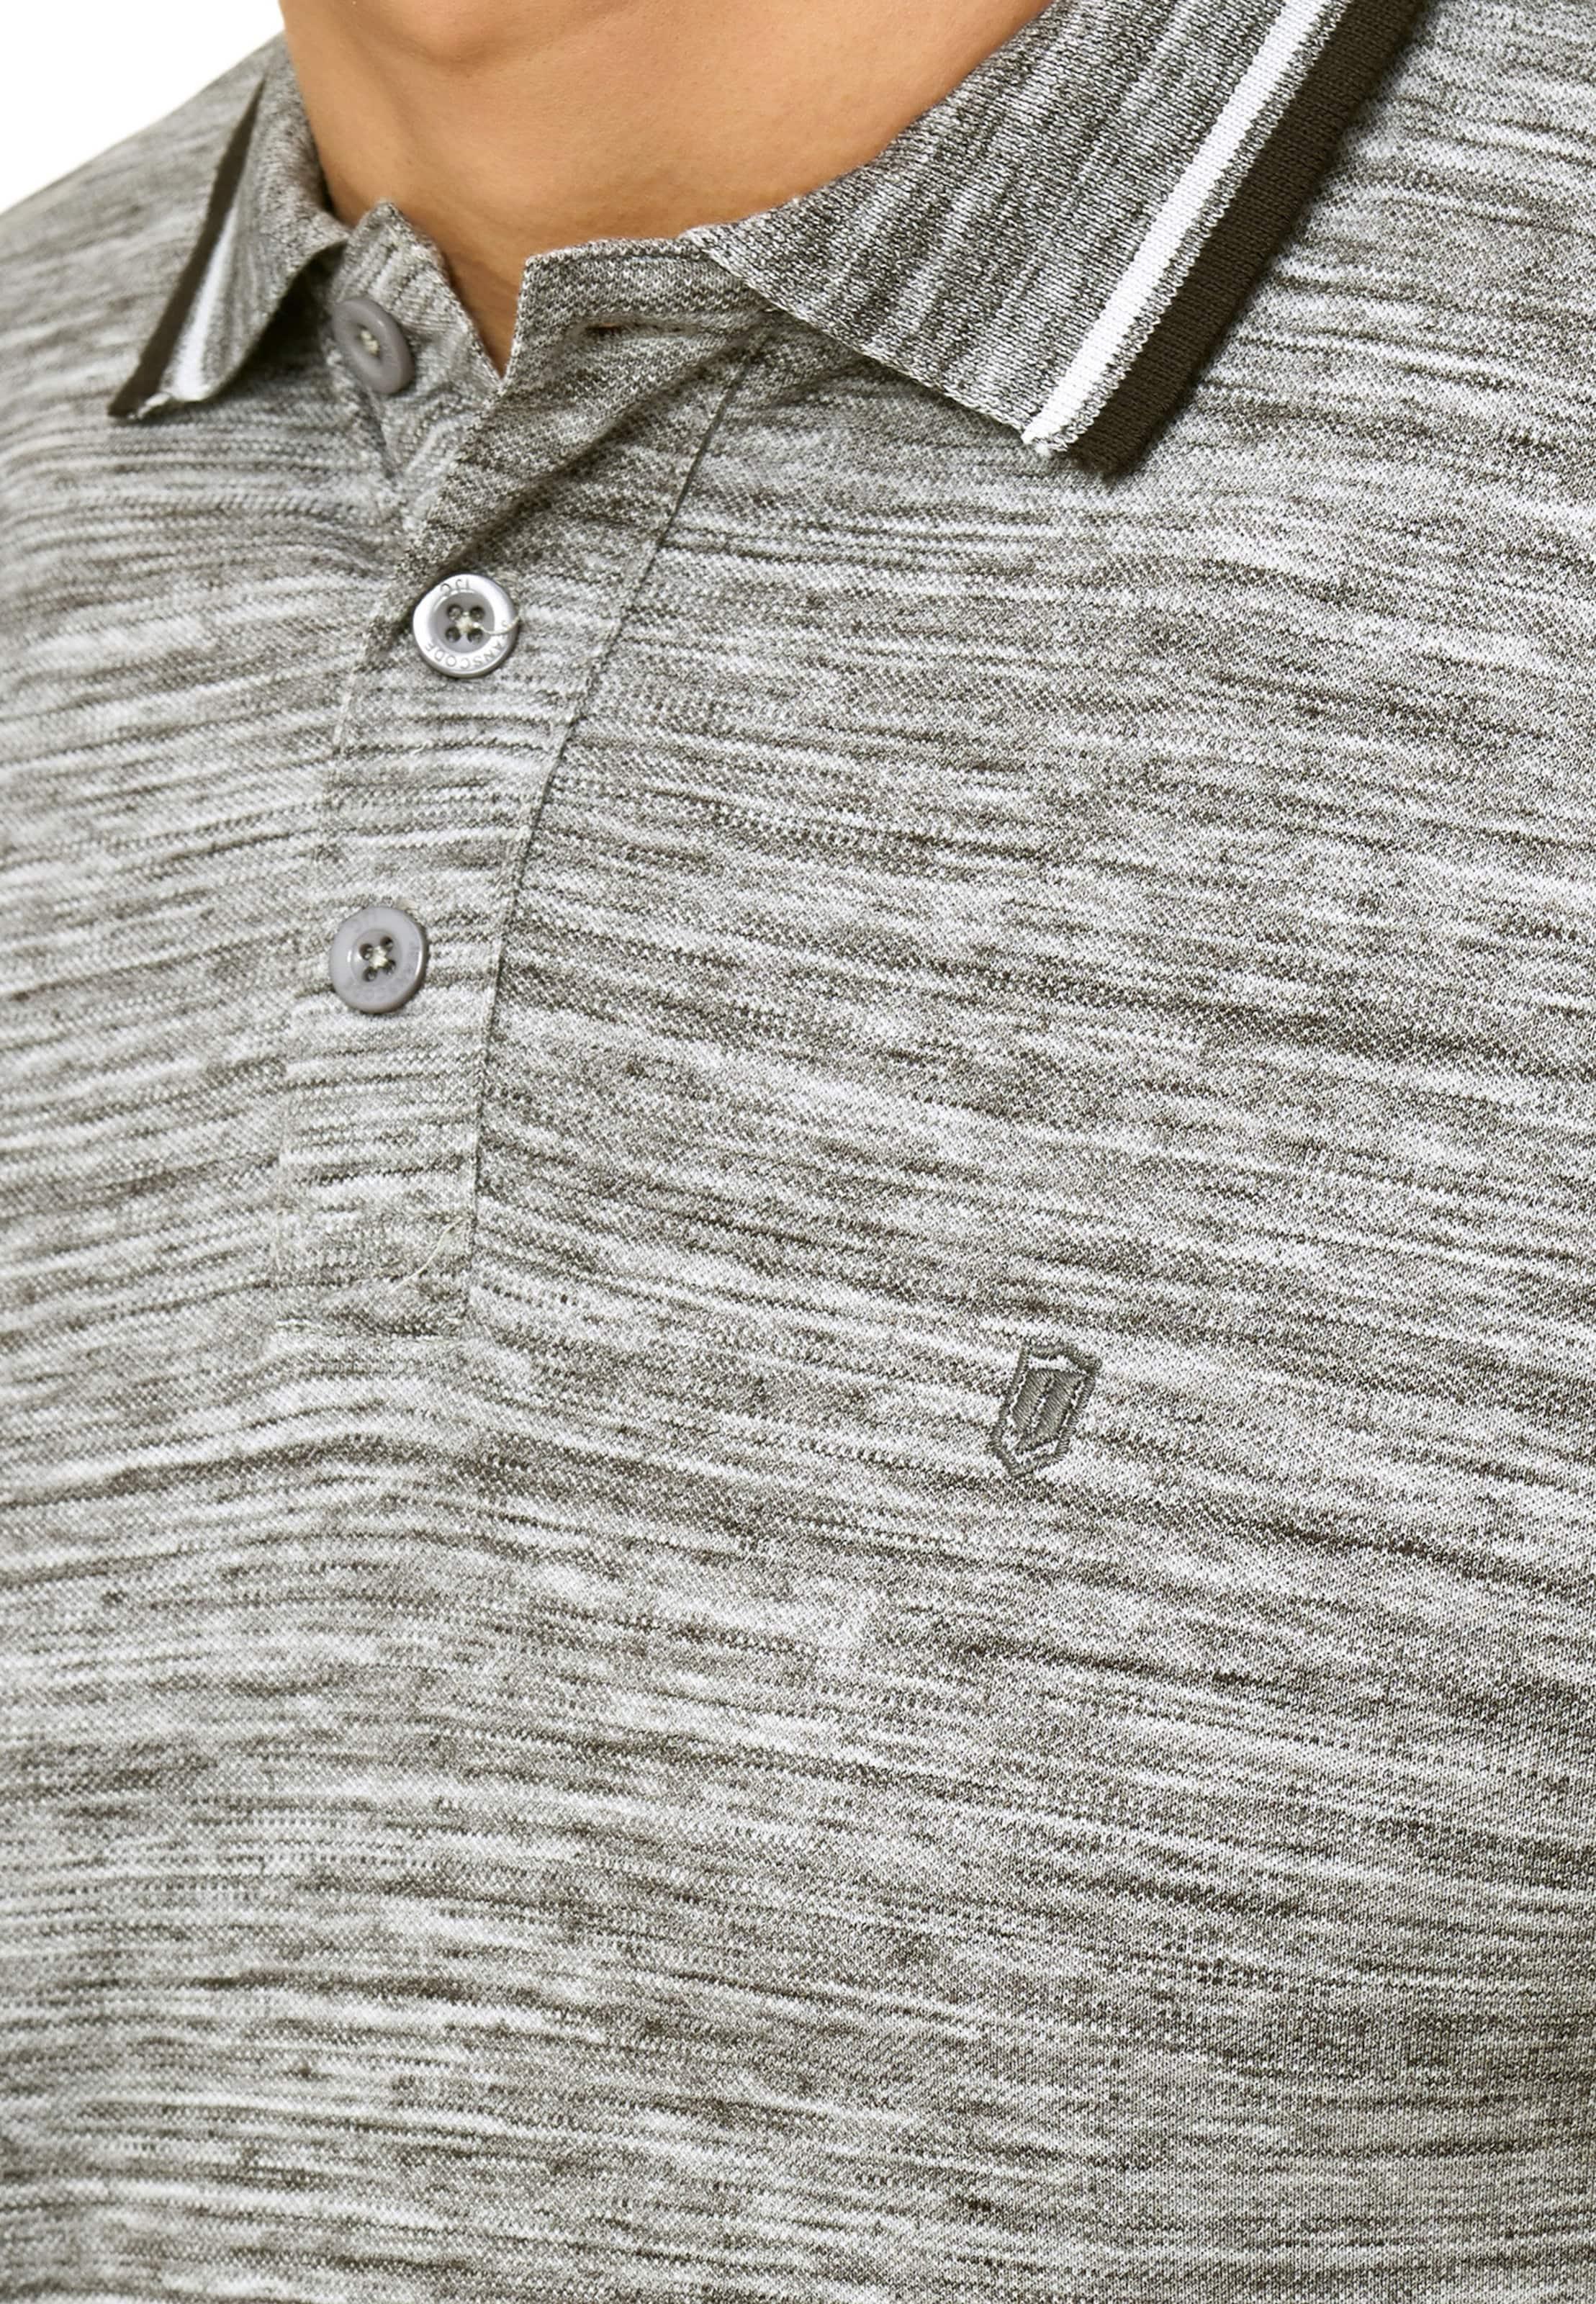 'noah' In Graumeliert Jeans Indicode Poloshirt nN0wyvm8O